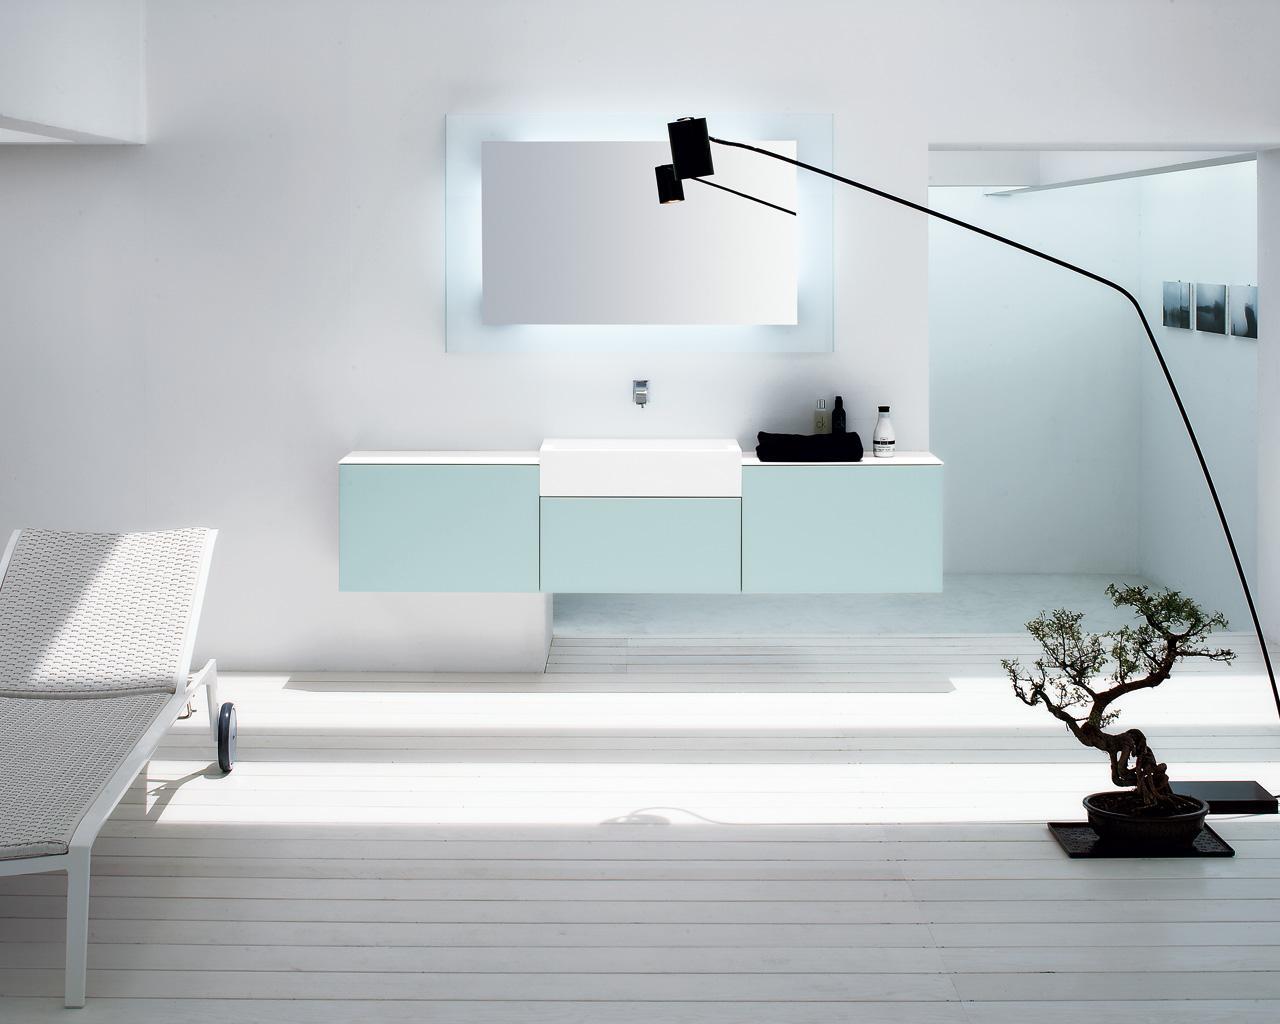 Glossy Vanity For Minimalist Bathroom – Trenta5 By Arlex Italia